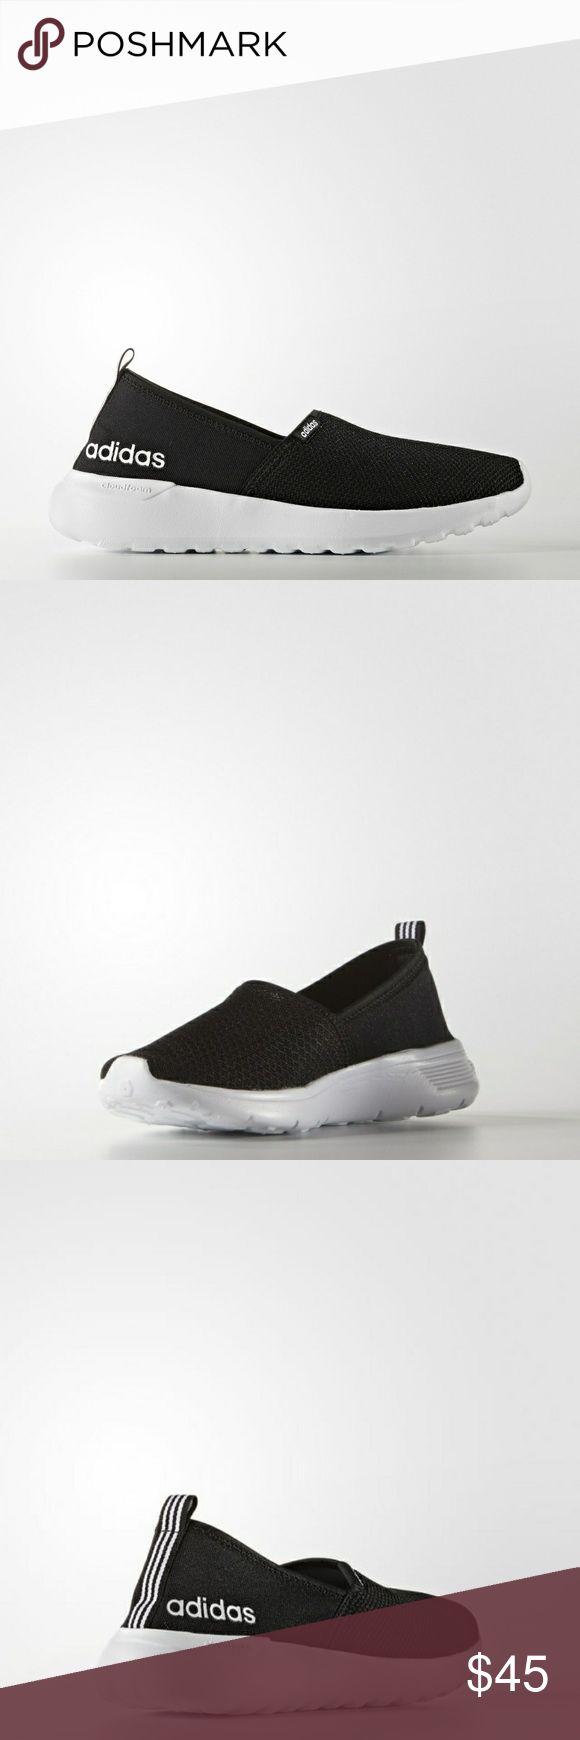 Adidas Cloudfoam Keychain Shoe